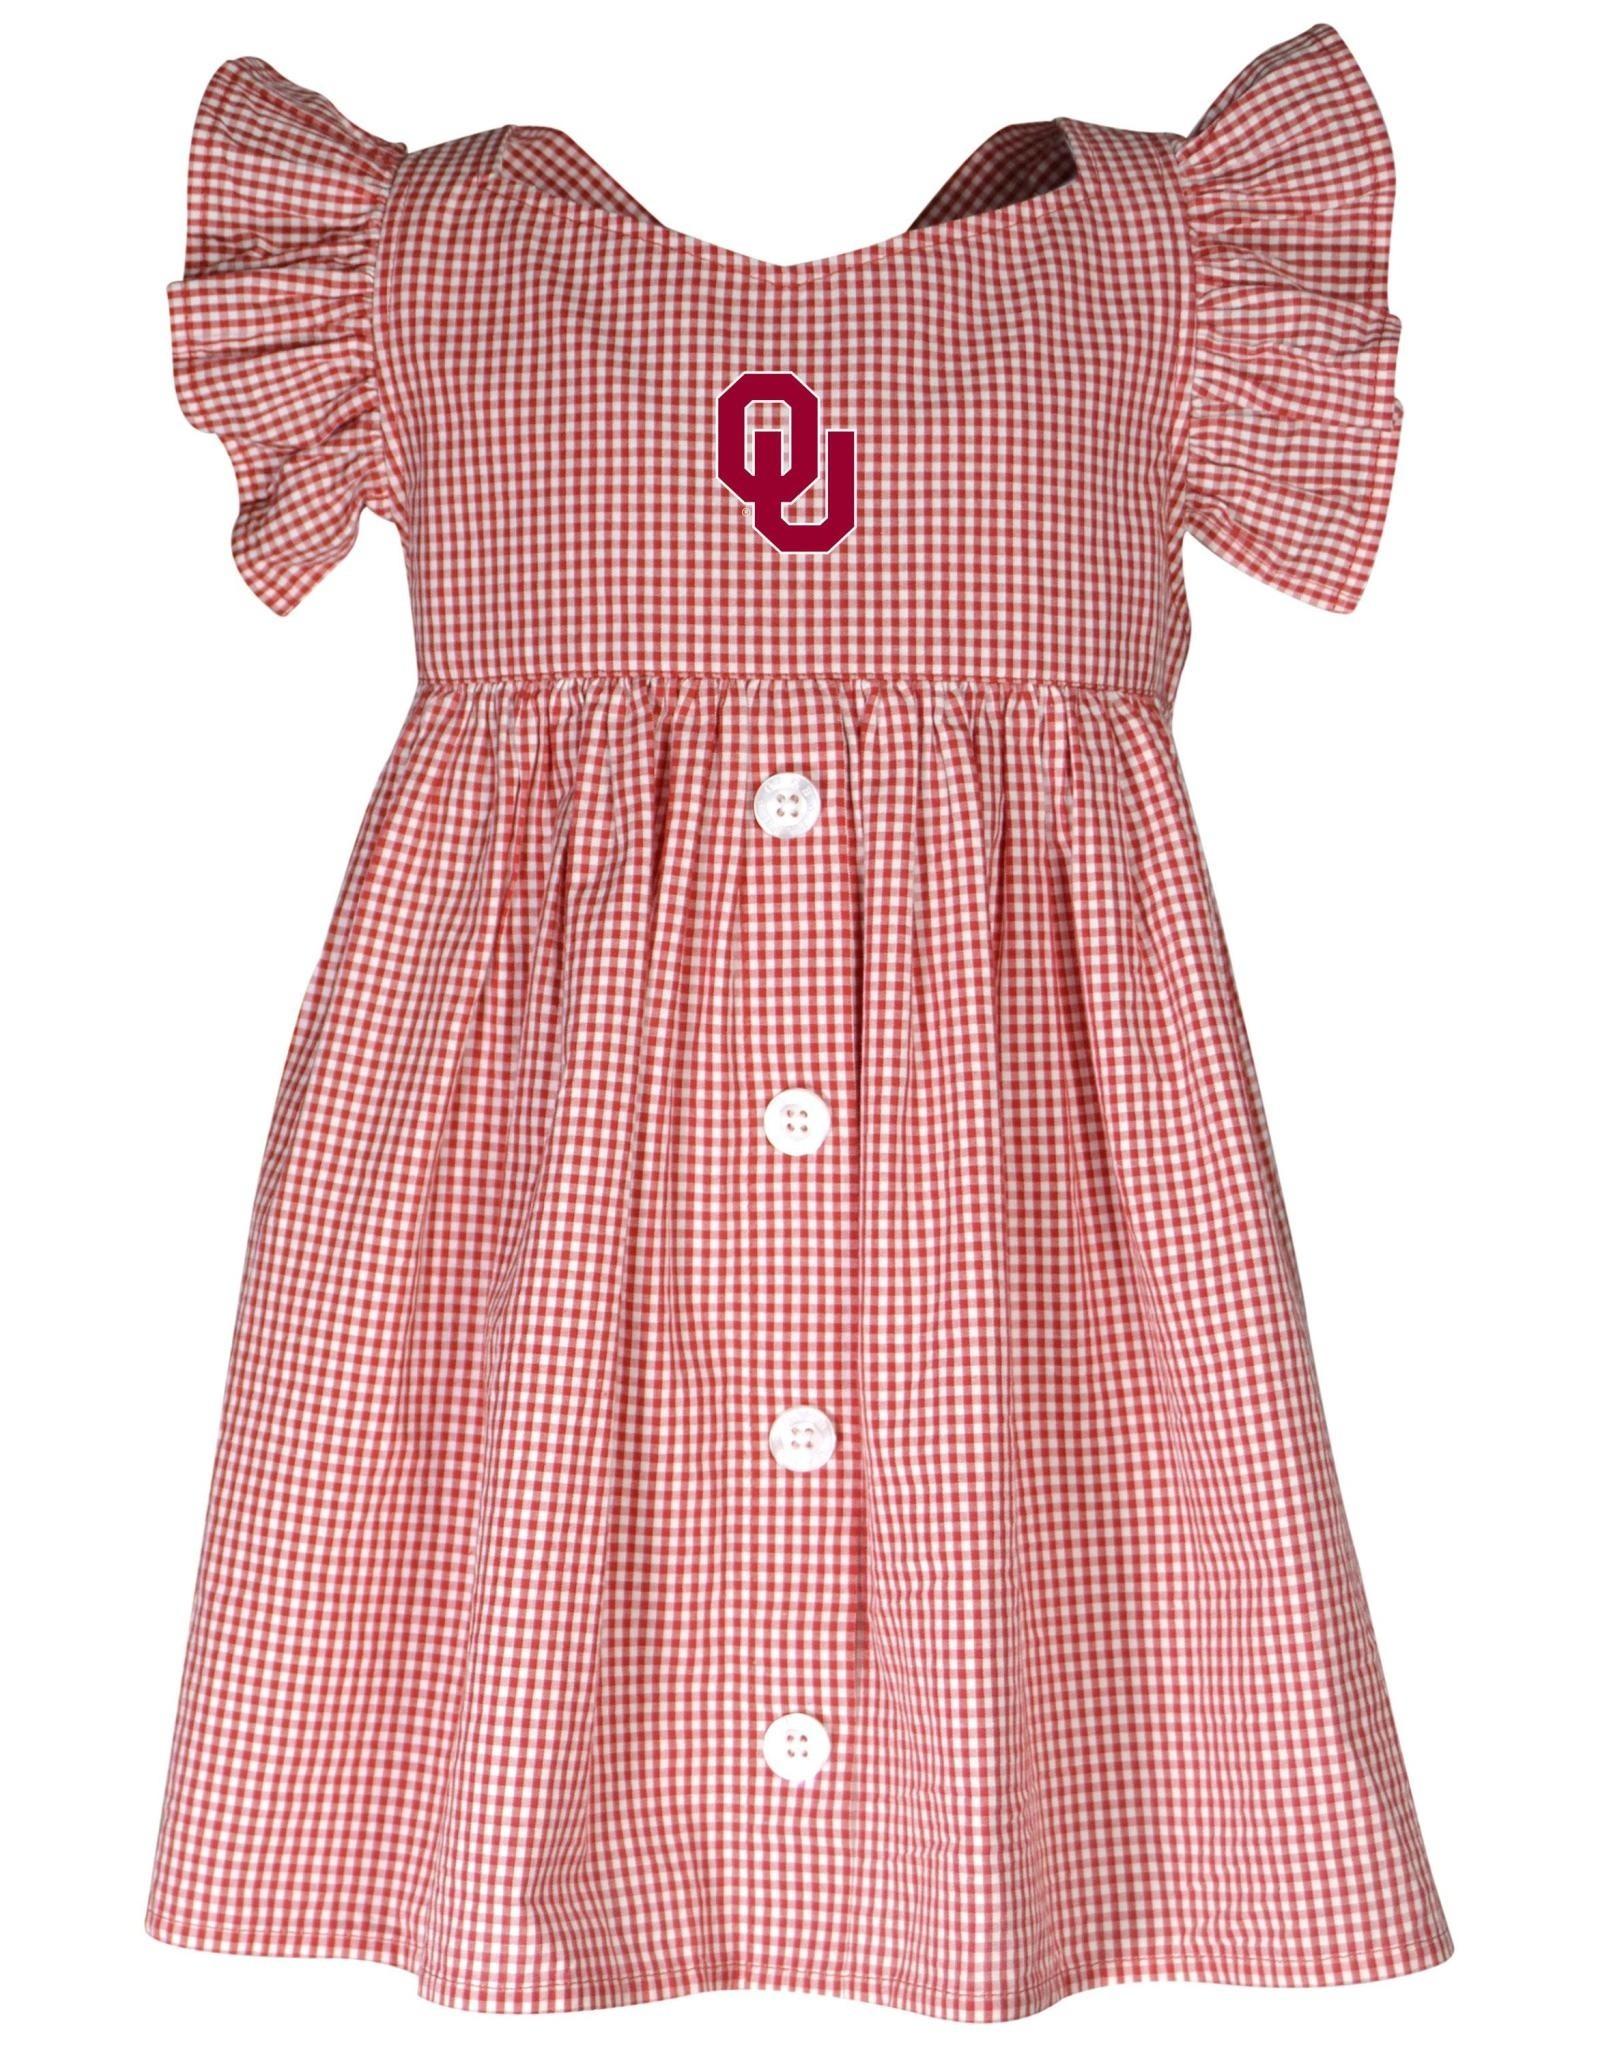 Garb Toddler Jada Dress